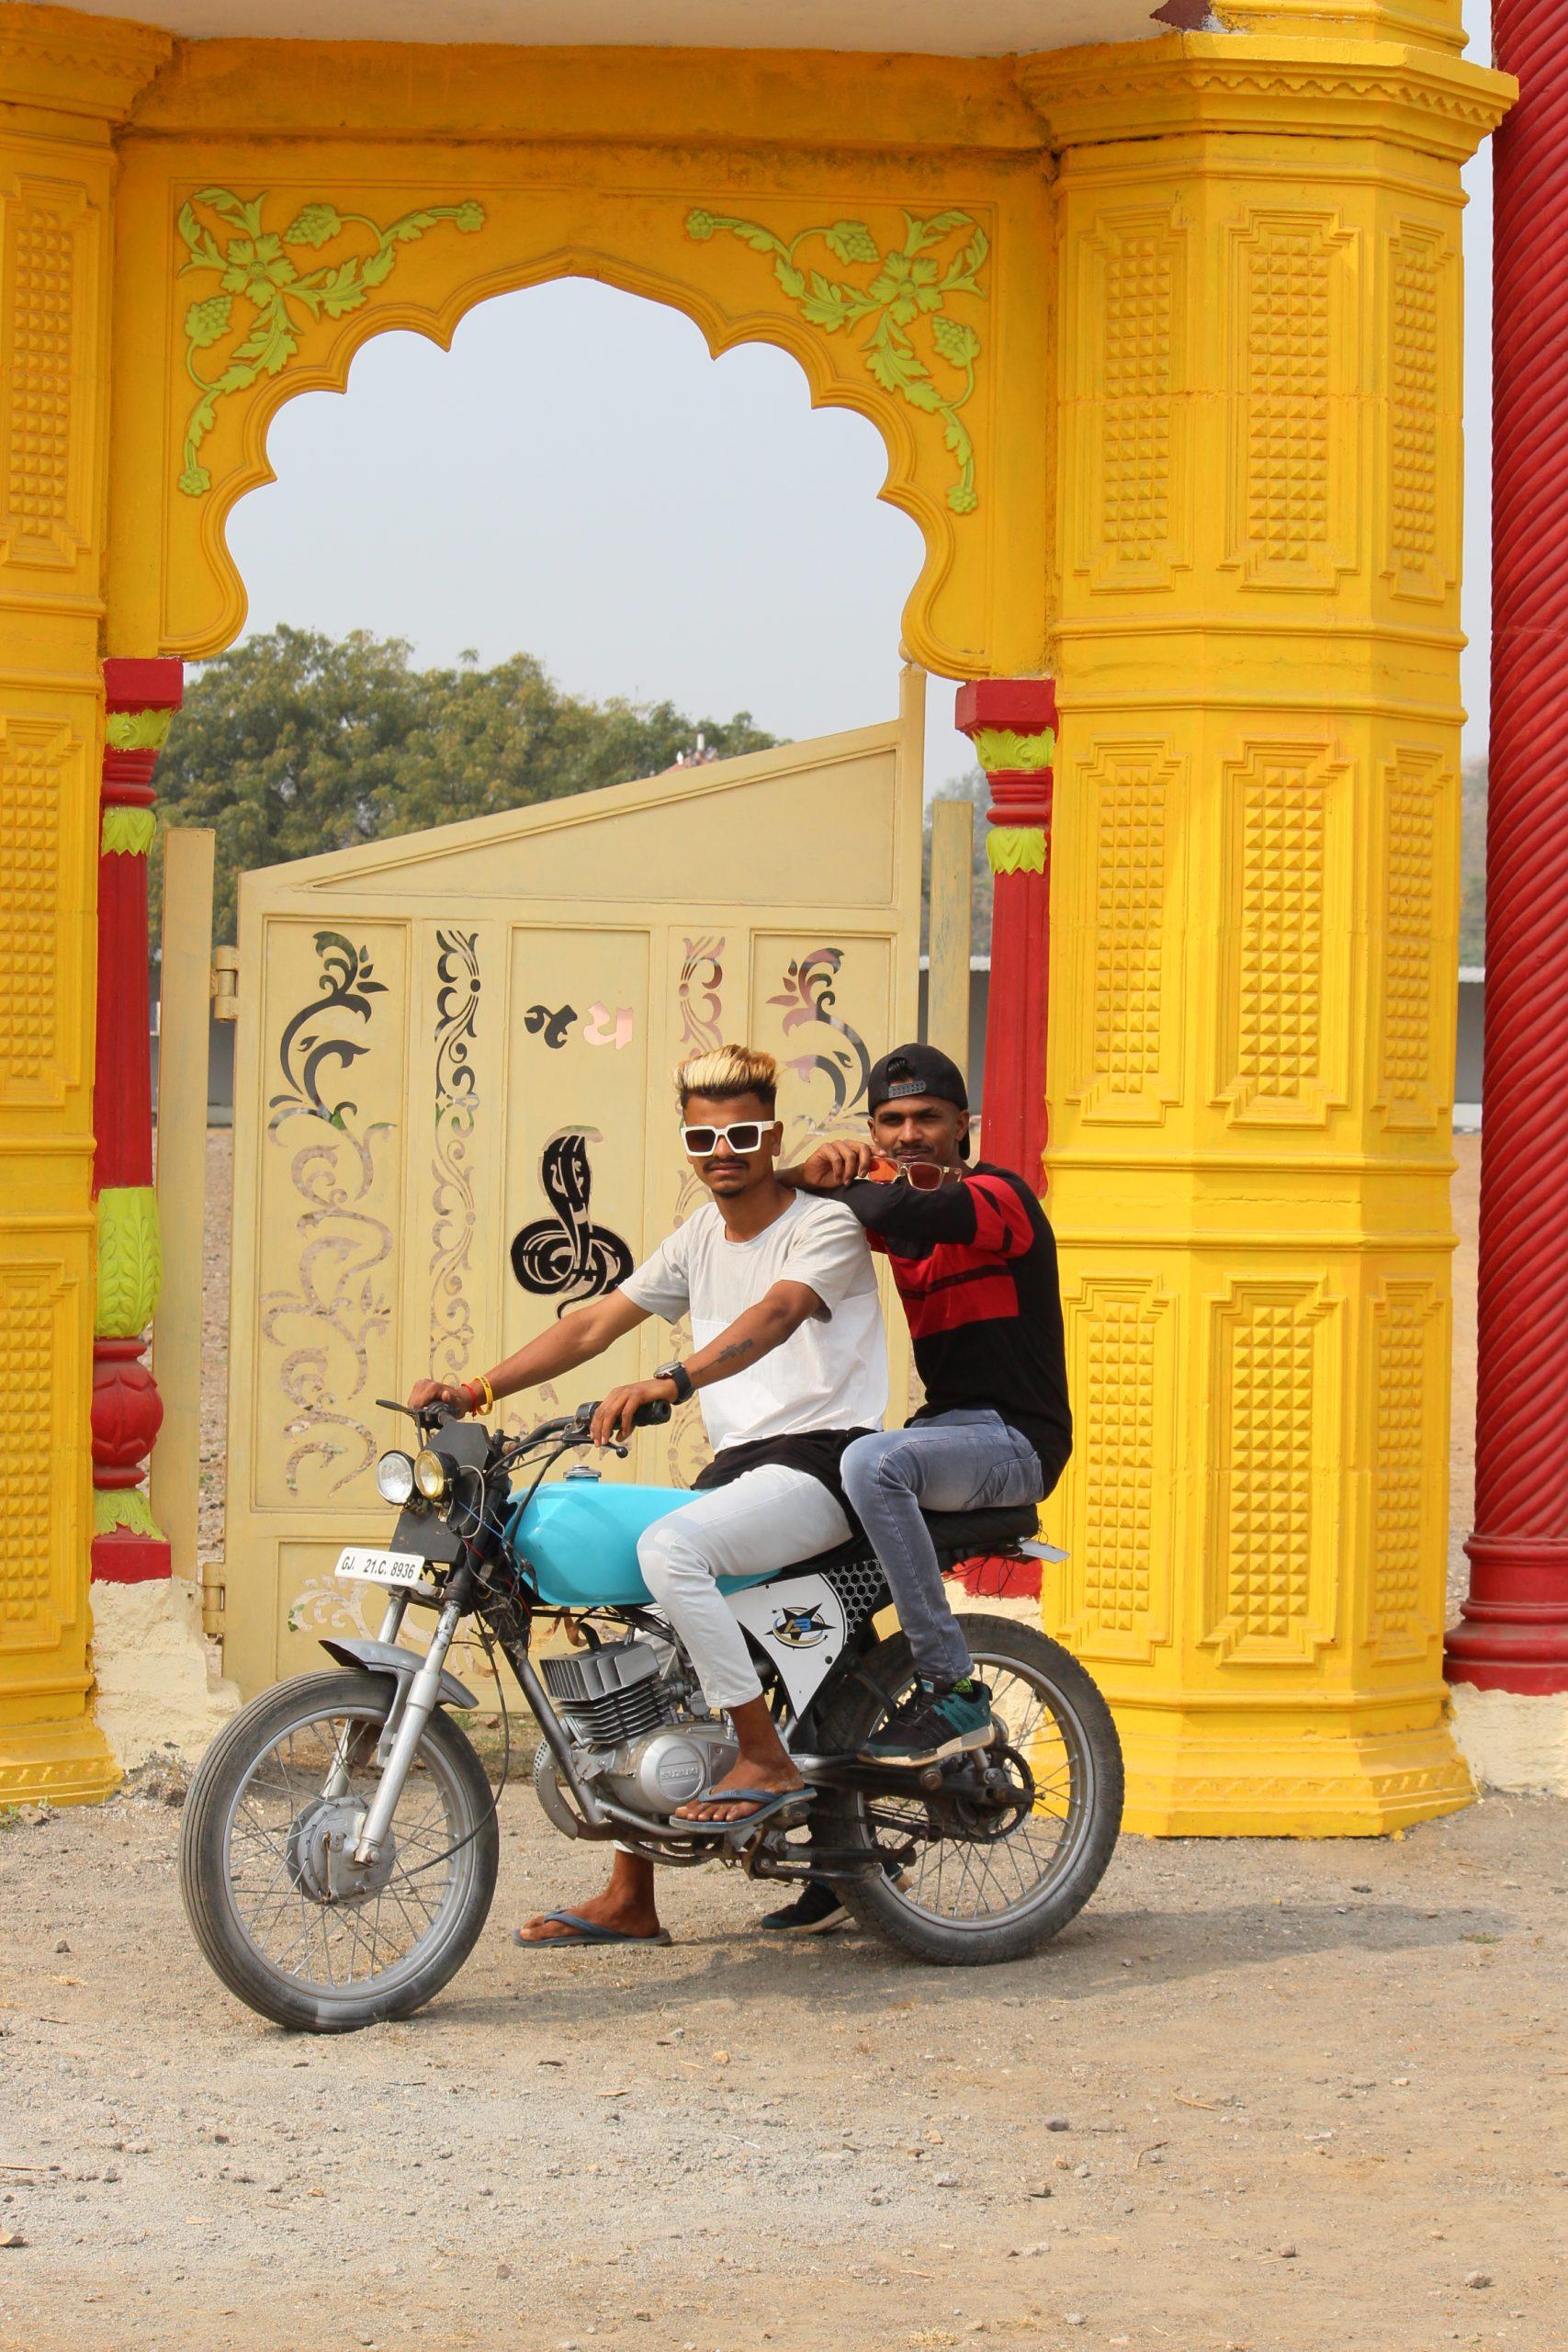 Boys posing on the bike